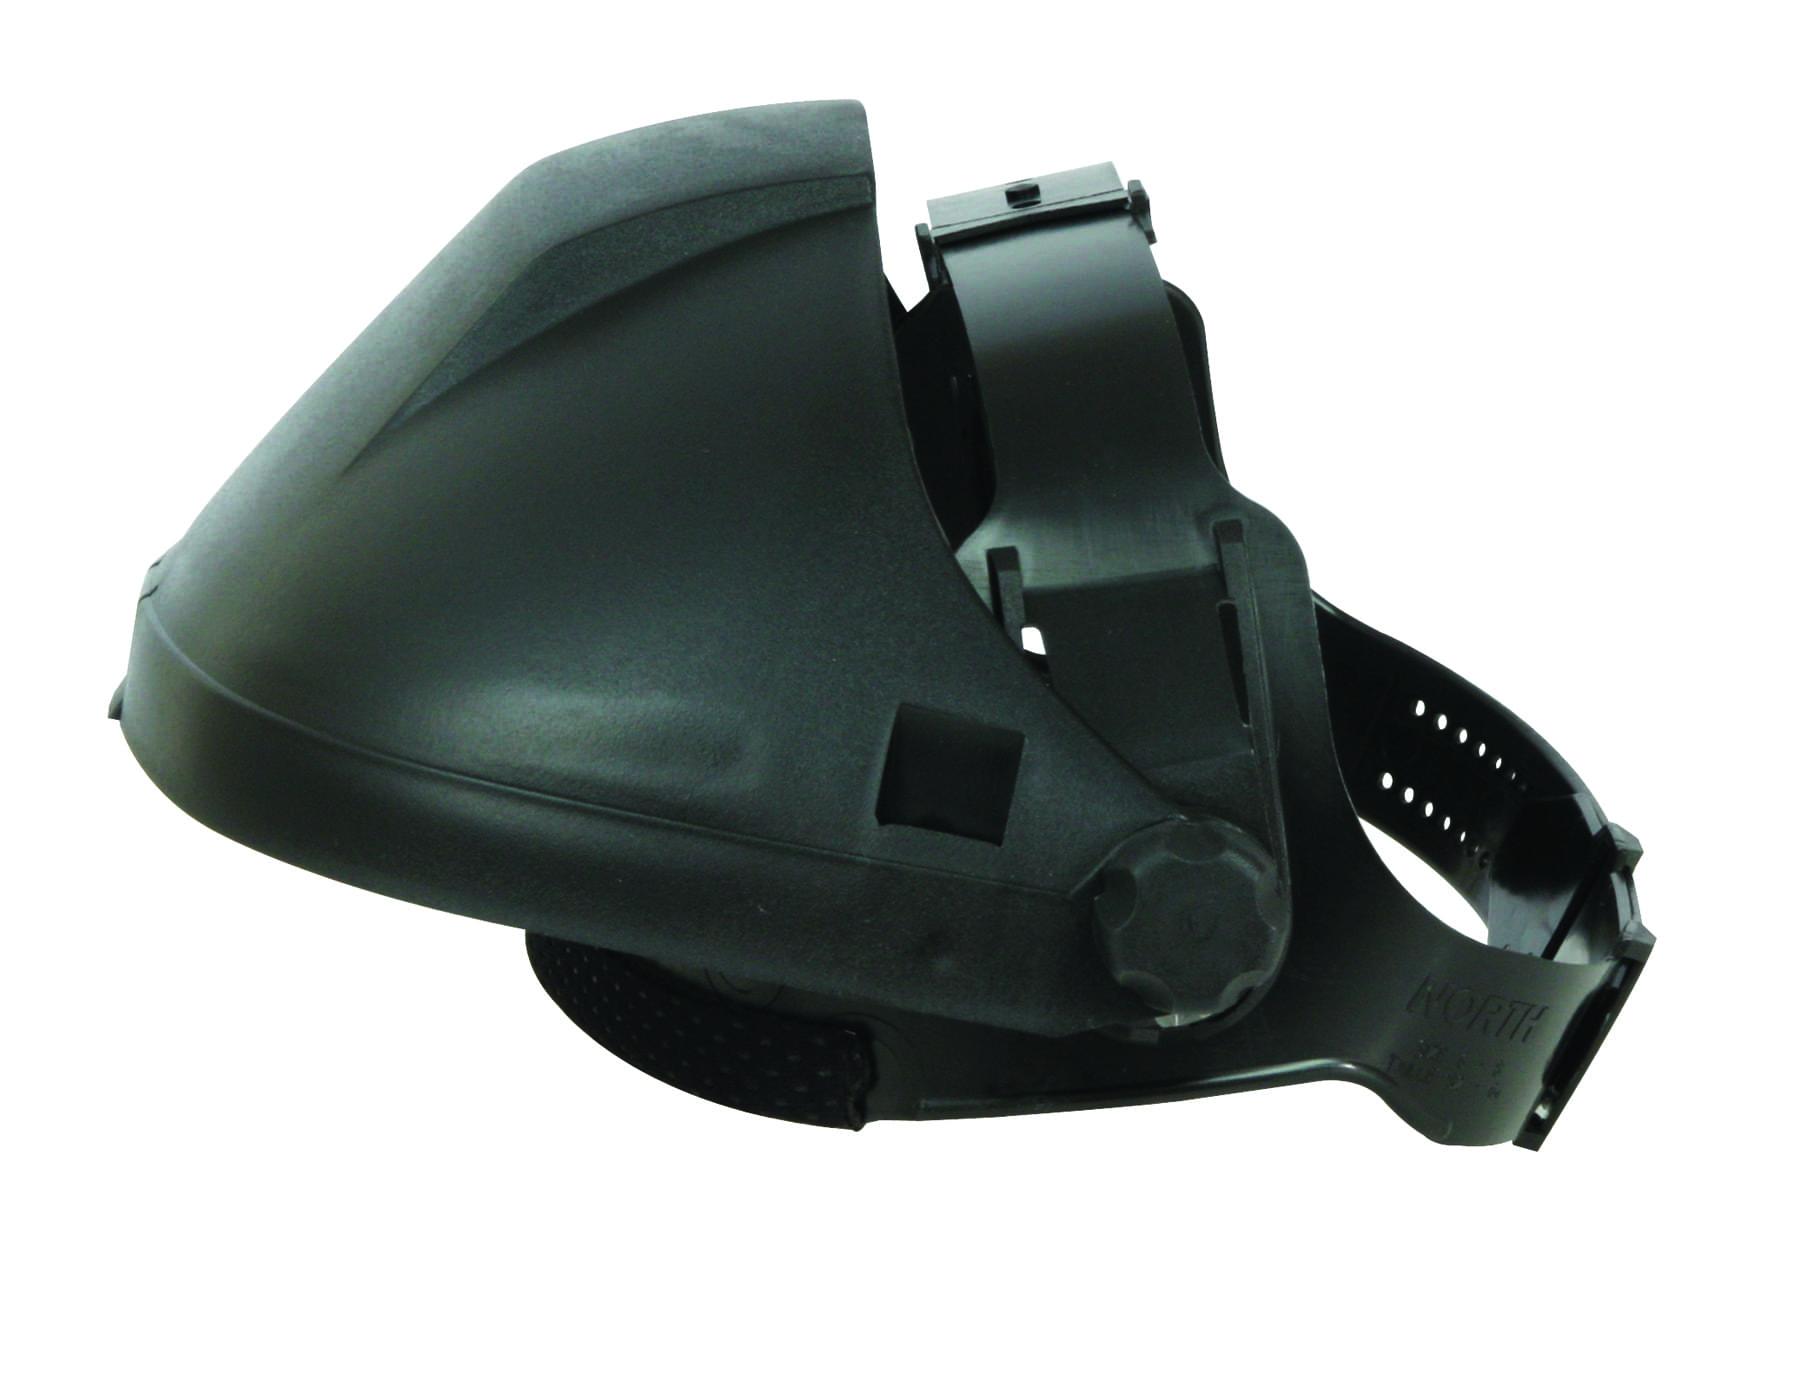 Headgear w/ratchet for Faceshield 039-67200